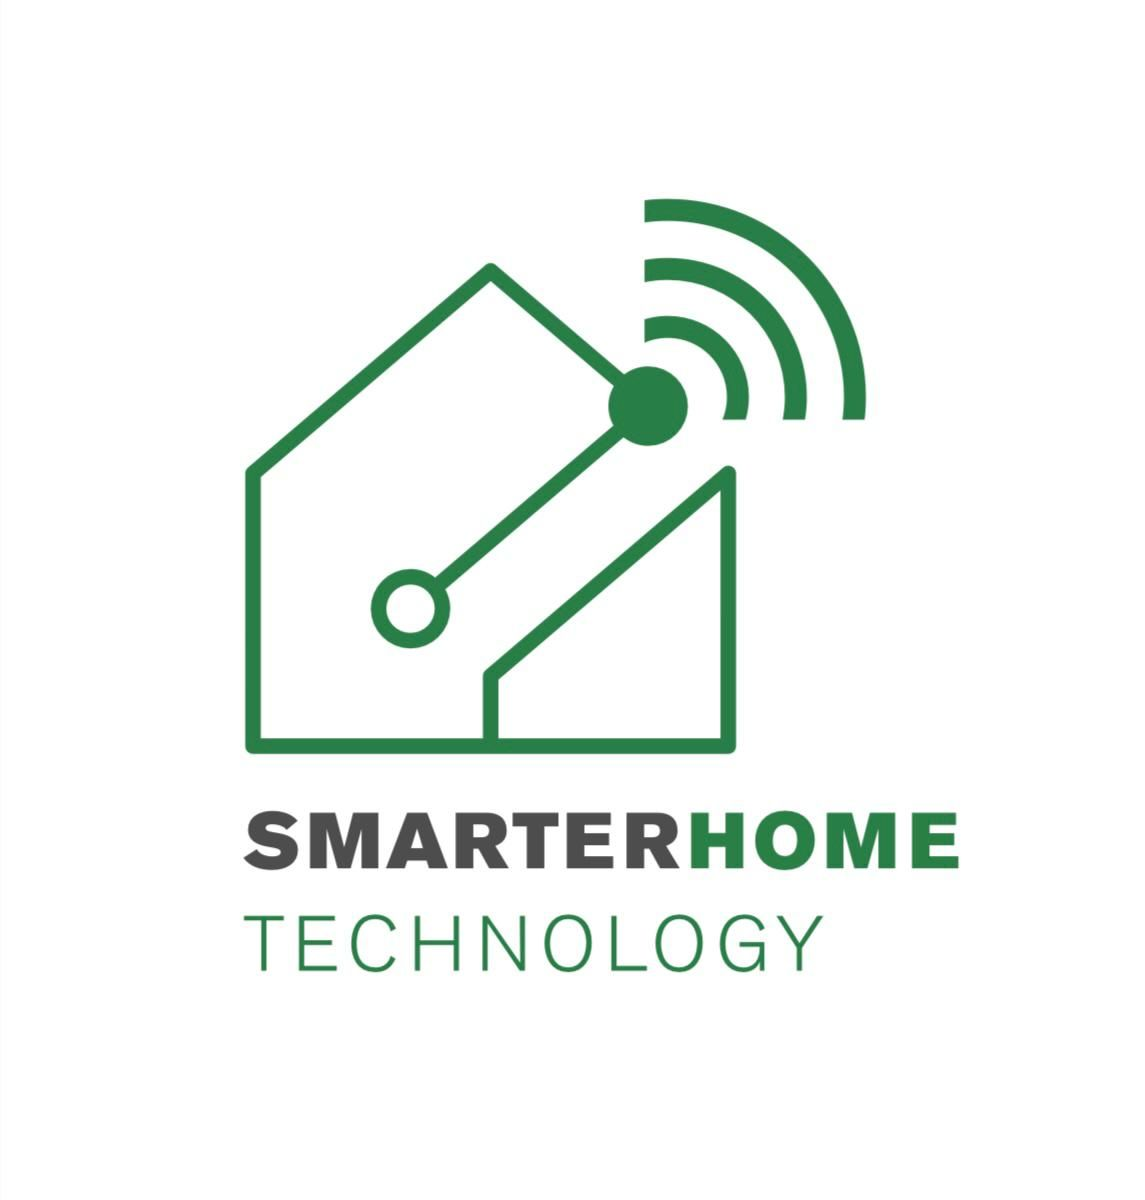 Smarter Home Technology